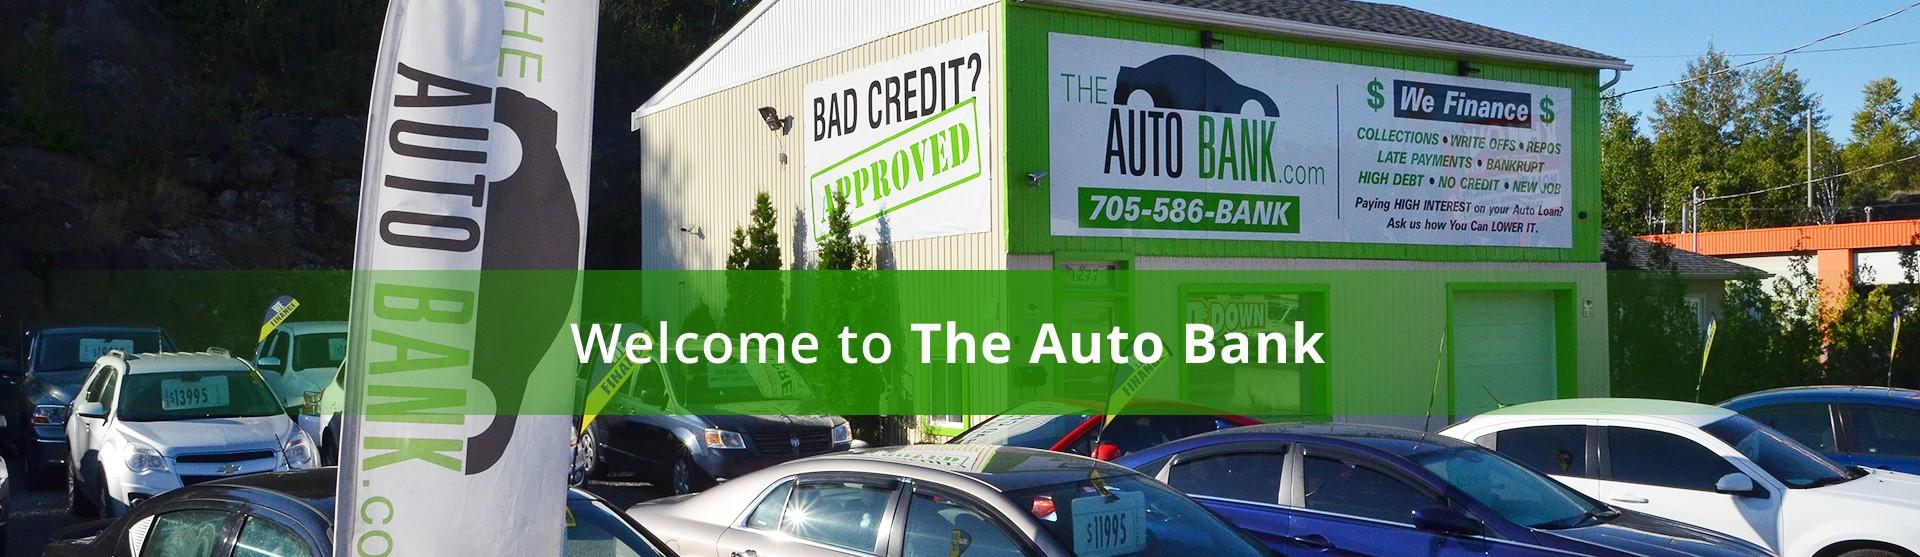 Sudbury Car Dealerships >> The Auto Bank Used Car Dealership Sudbury Ontario